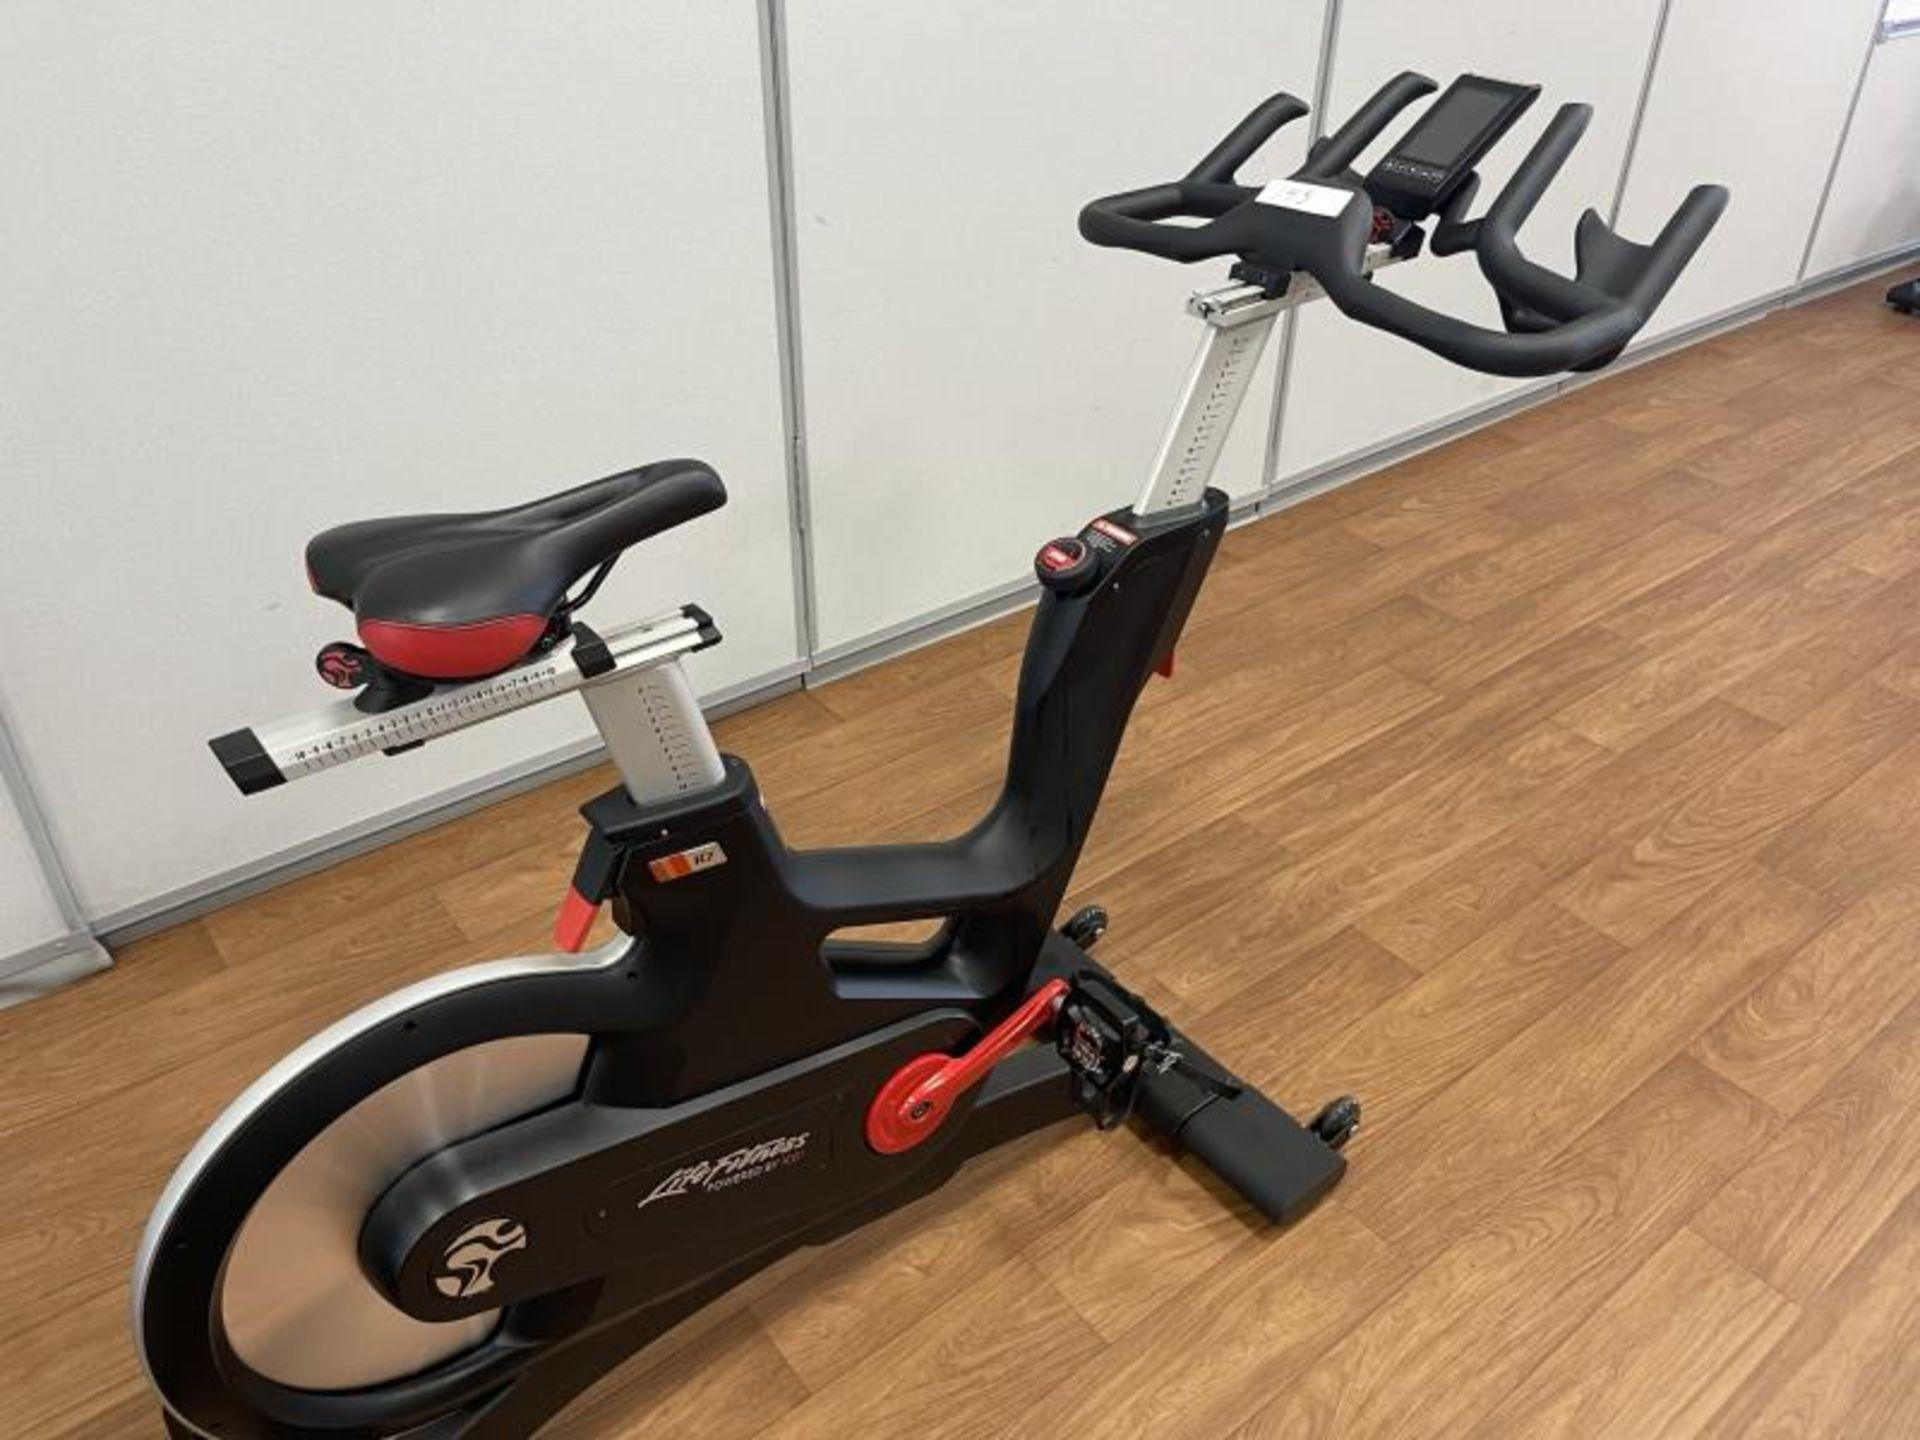 2018 Life Fitness IC7 Spin Bikes M: IC-LFIC7B2-01 - Image 2 of 5